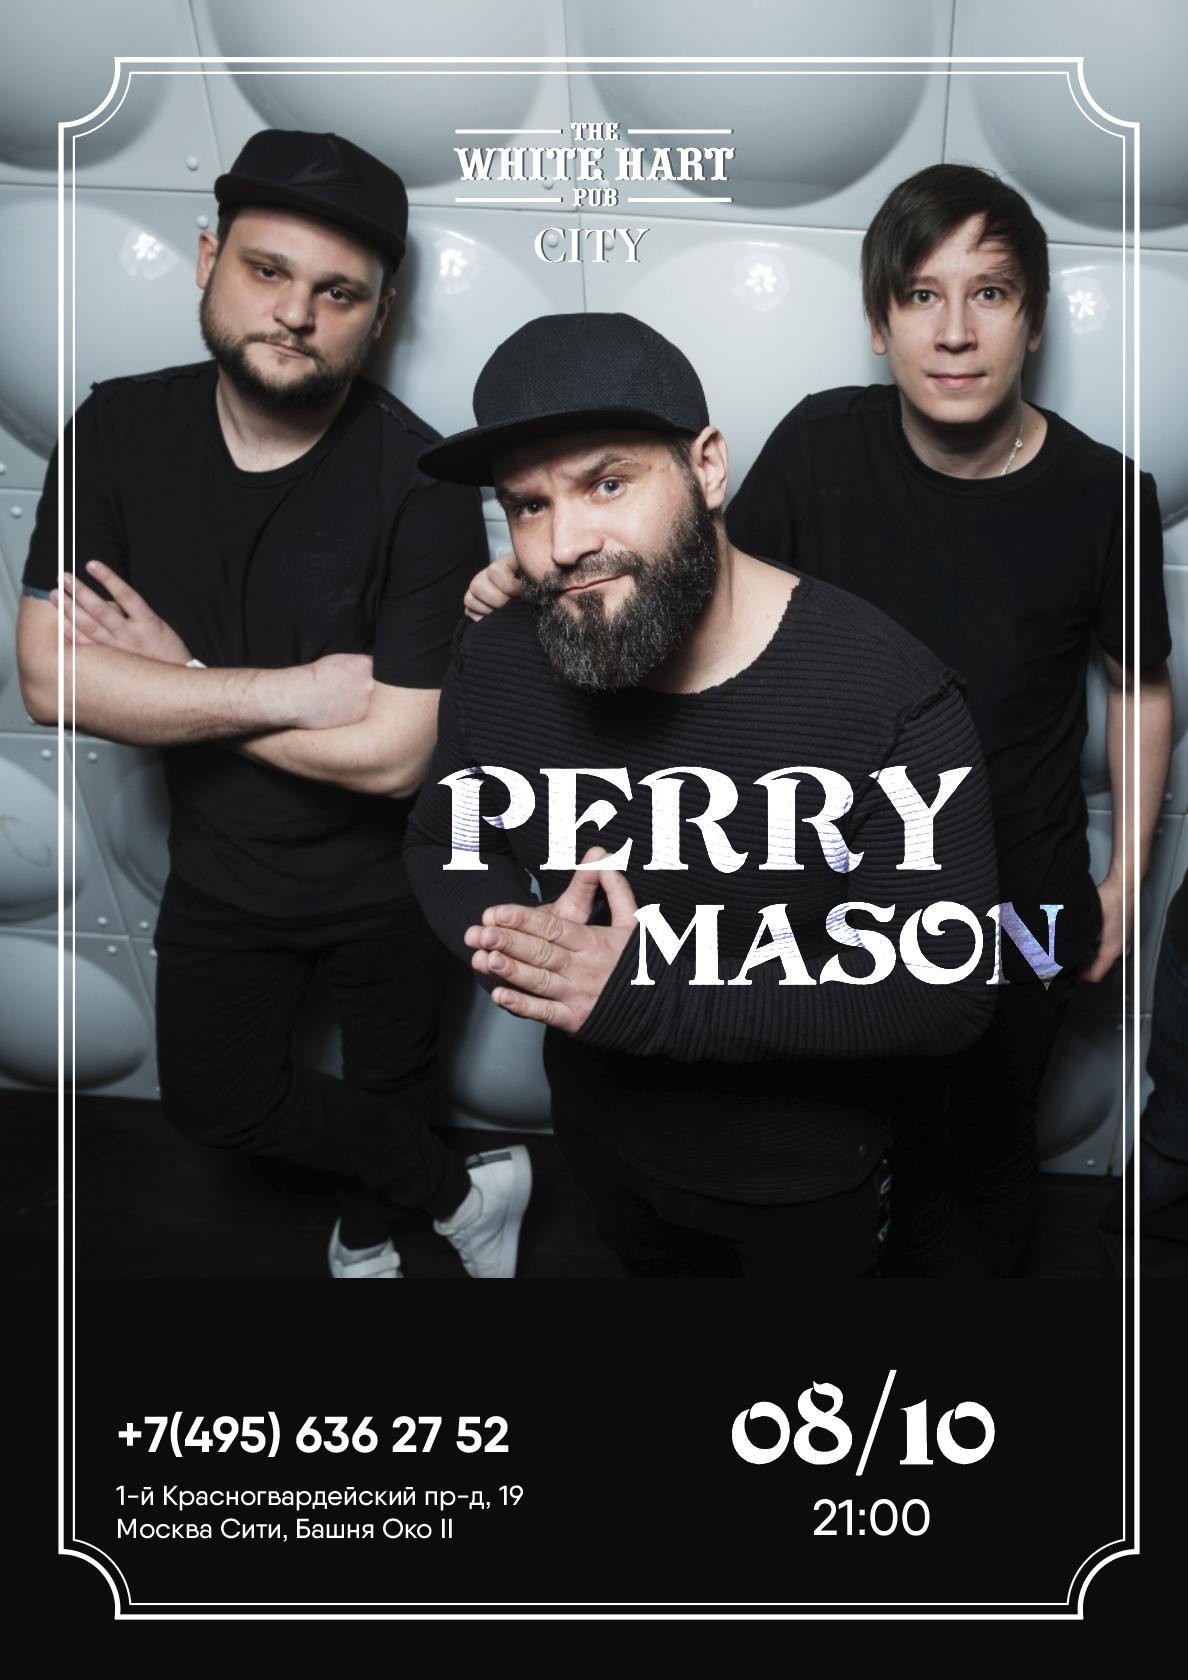 Афиша! 08 октября — Кавер Бэнд PERRY MASON в White Hart Pub Moscow City